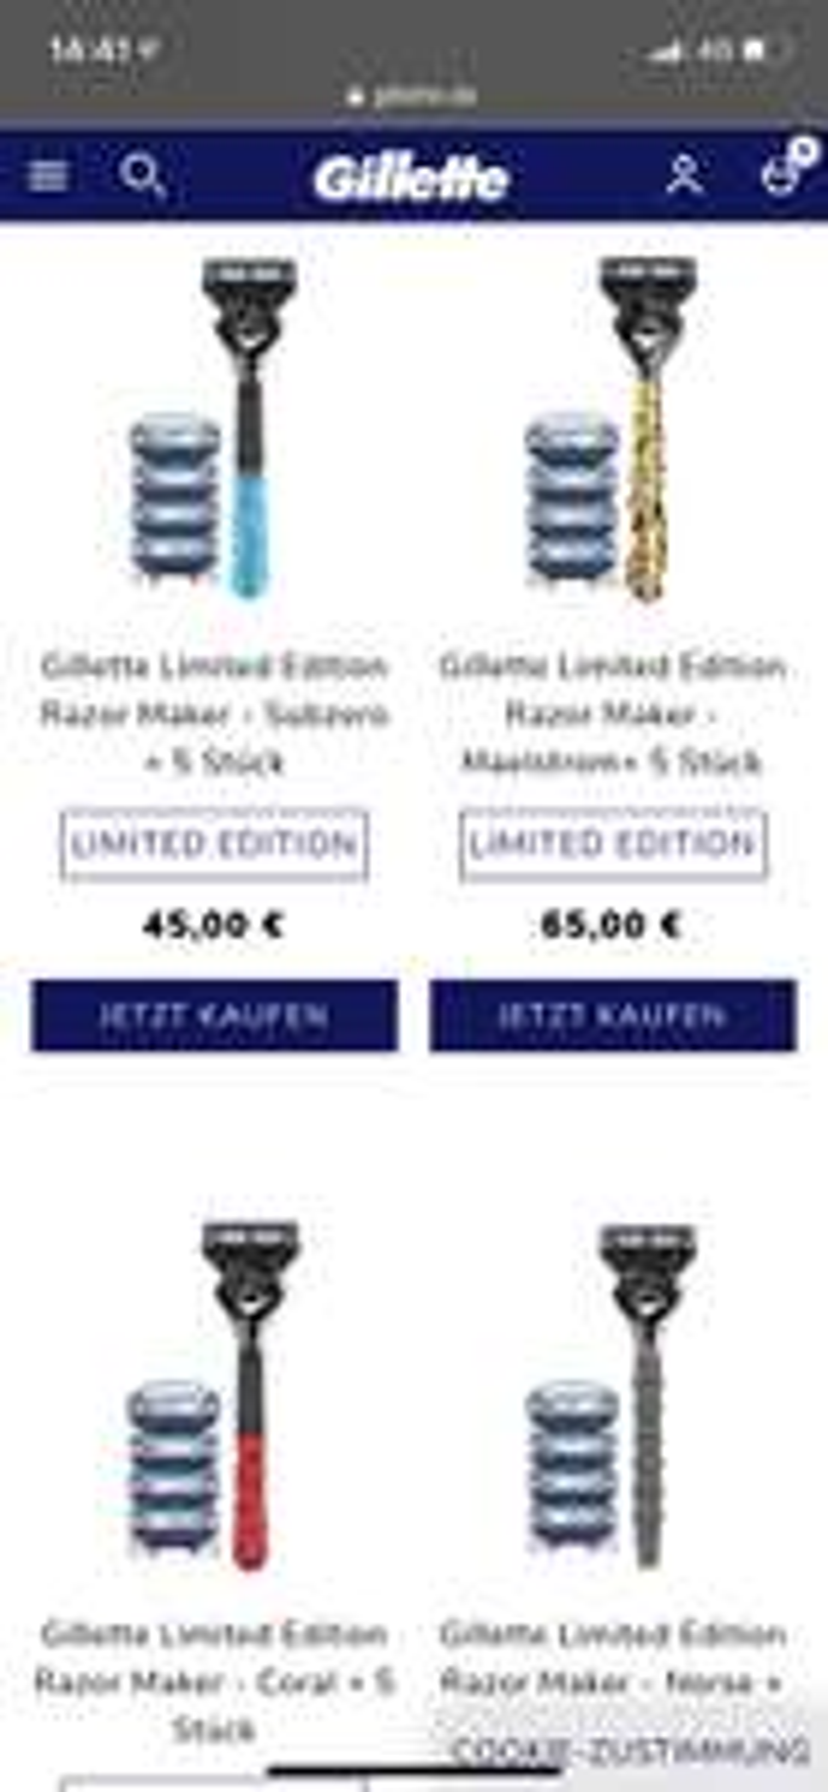 GILLETTE LIMITED EDITION RAZOR MAKER - XXX + 5 STÜCK + Gratis VSK